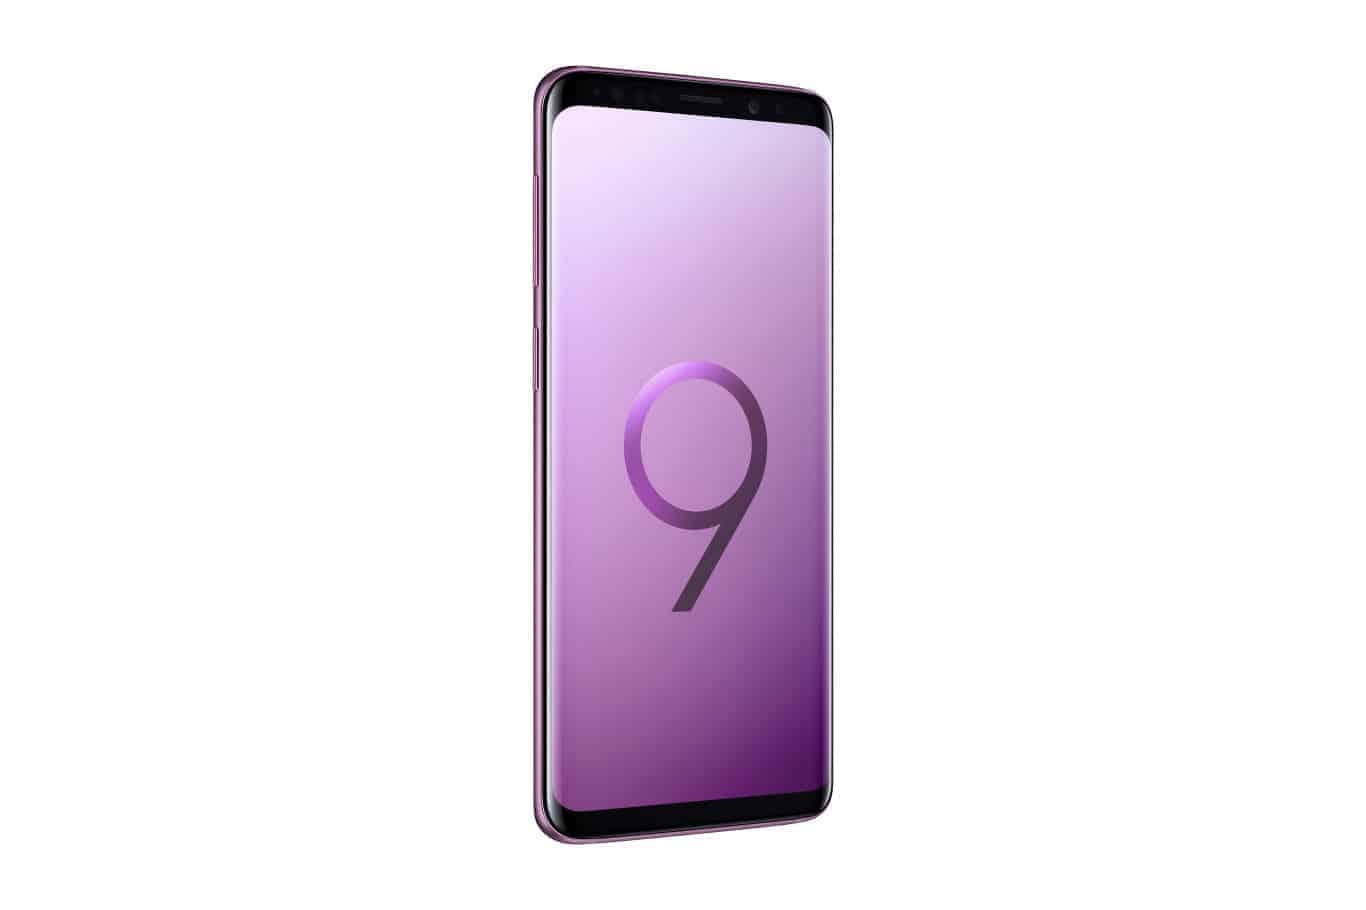 Samsung Galaxy S9 Press 9